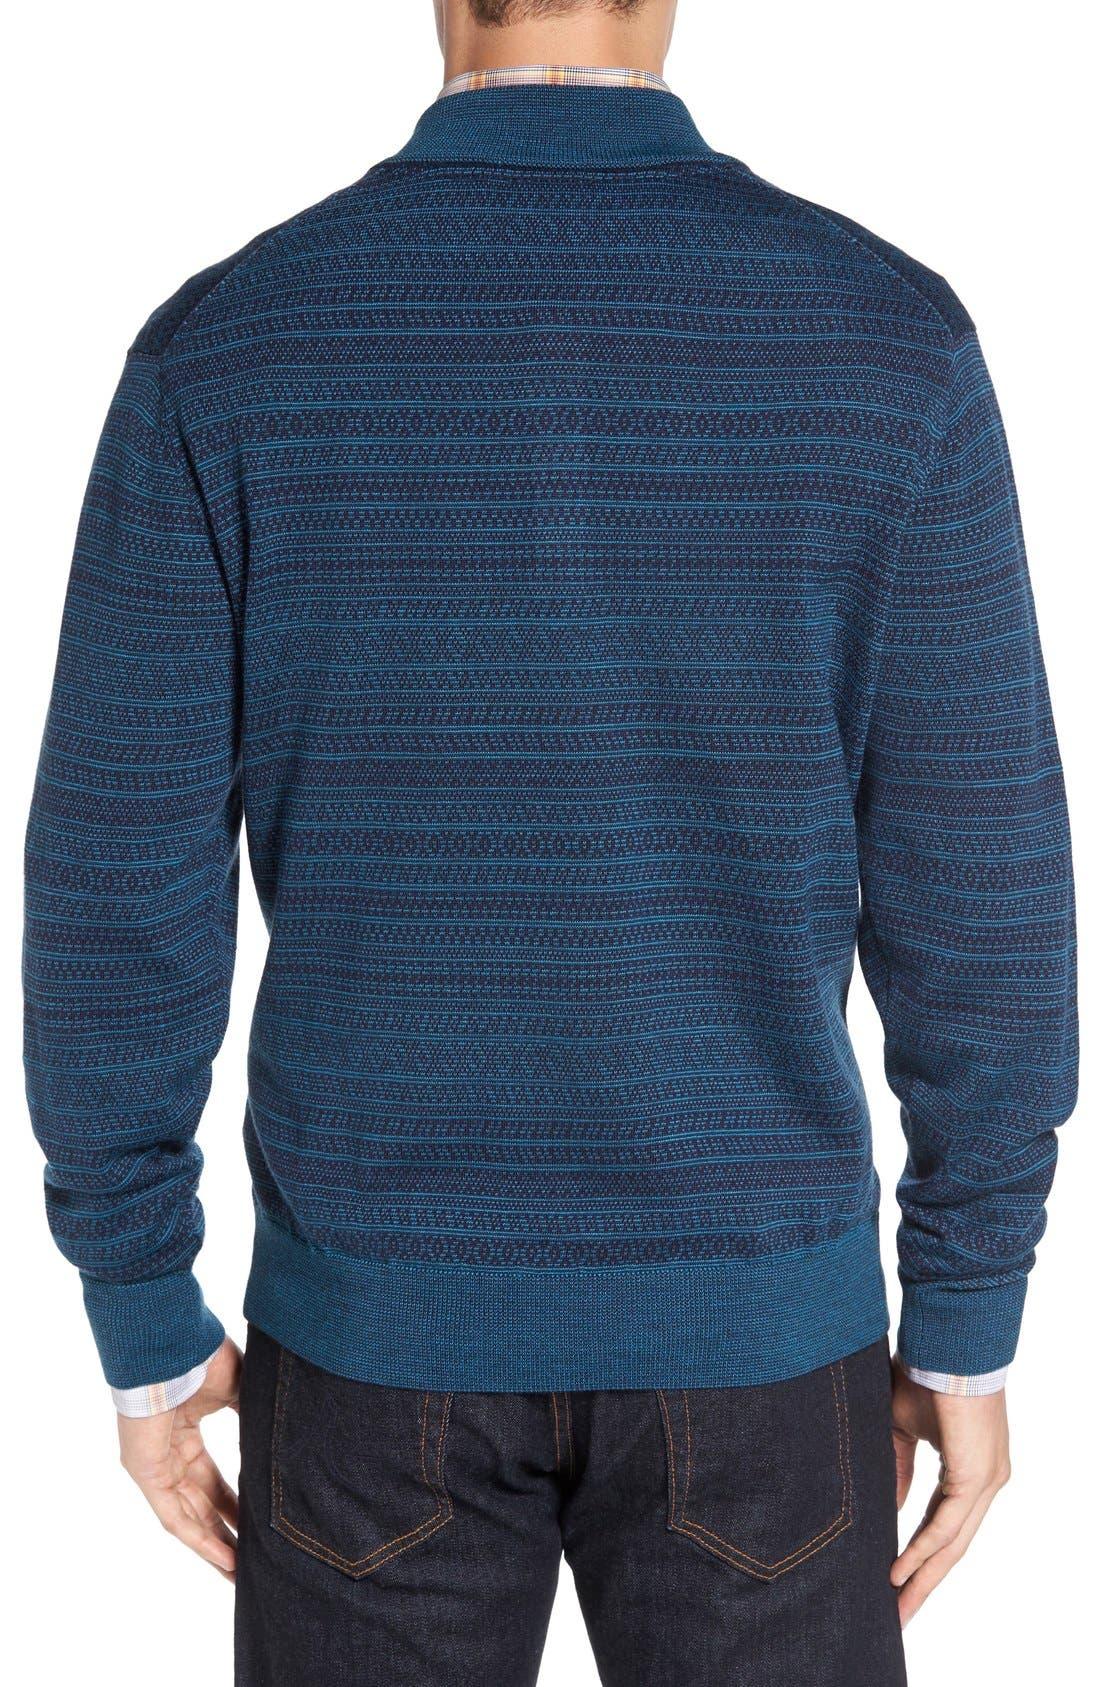 'Douglas Forest' Jacquard Wool Blend Sweater,                             Alternate thumbnail 5, color,